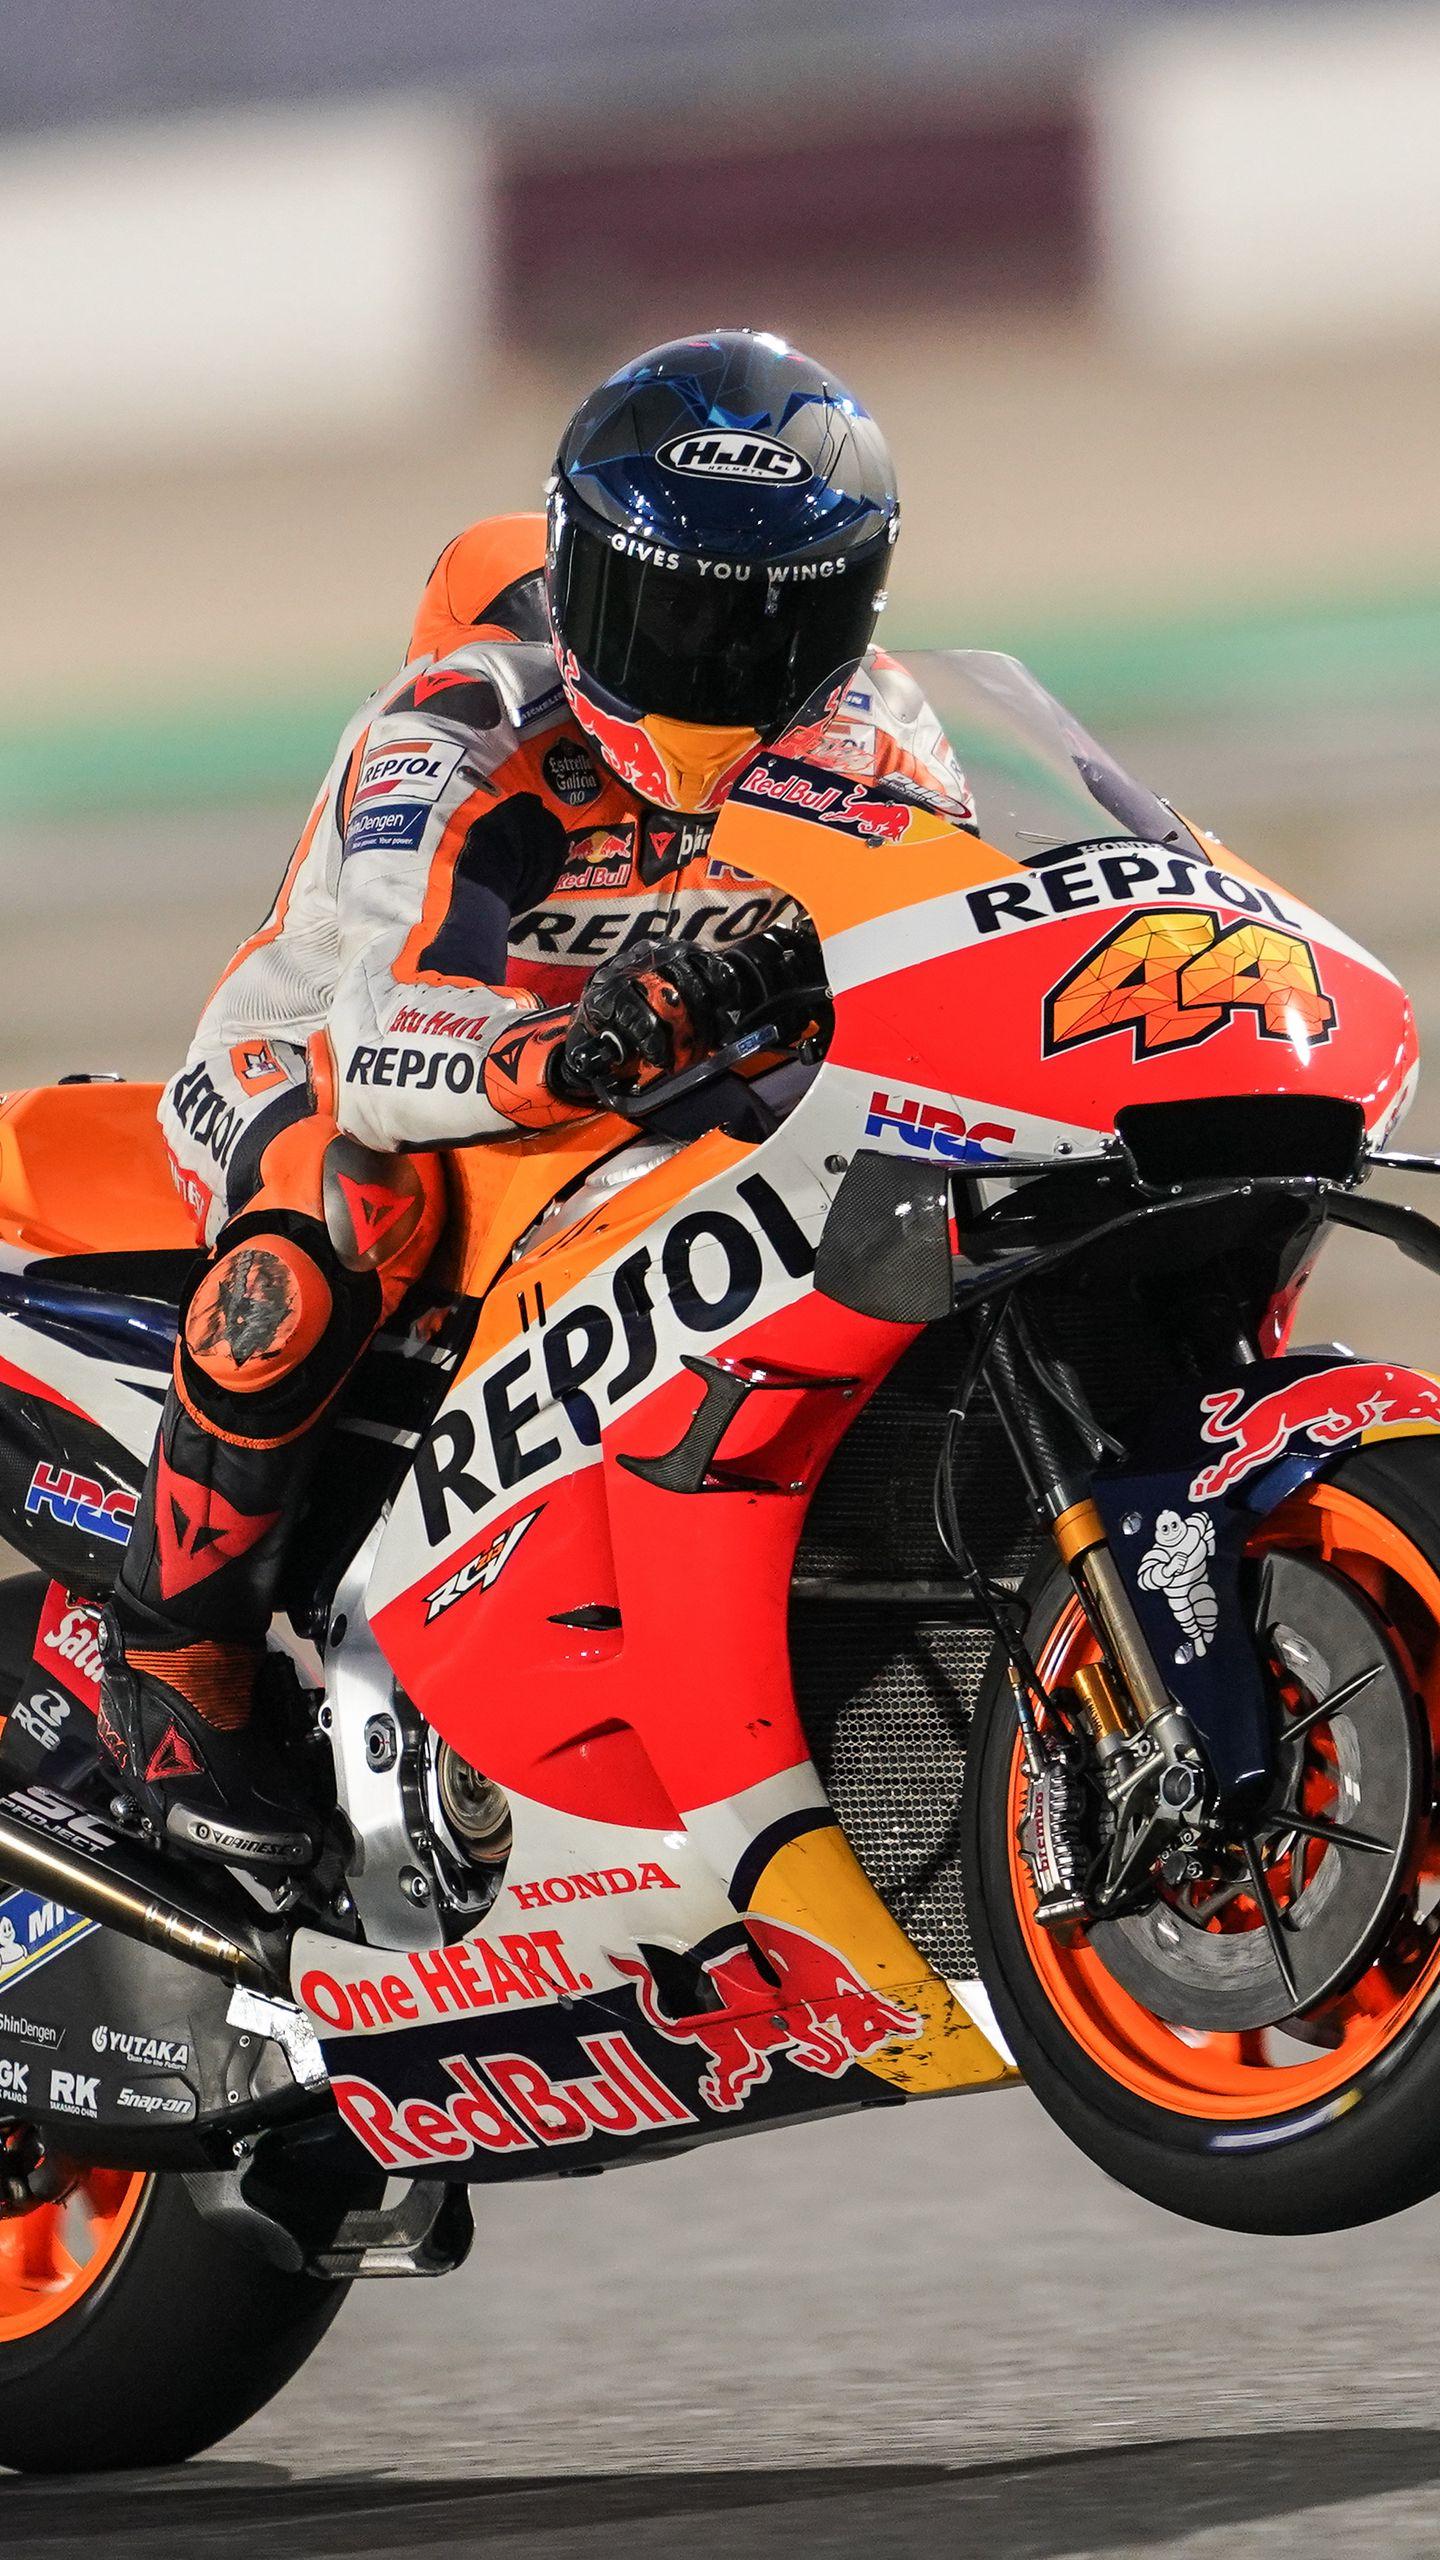 1440x2560 Wallpaper honda, motorcycle, motorcyclist, helmet, speed, track, orange